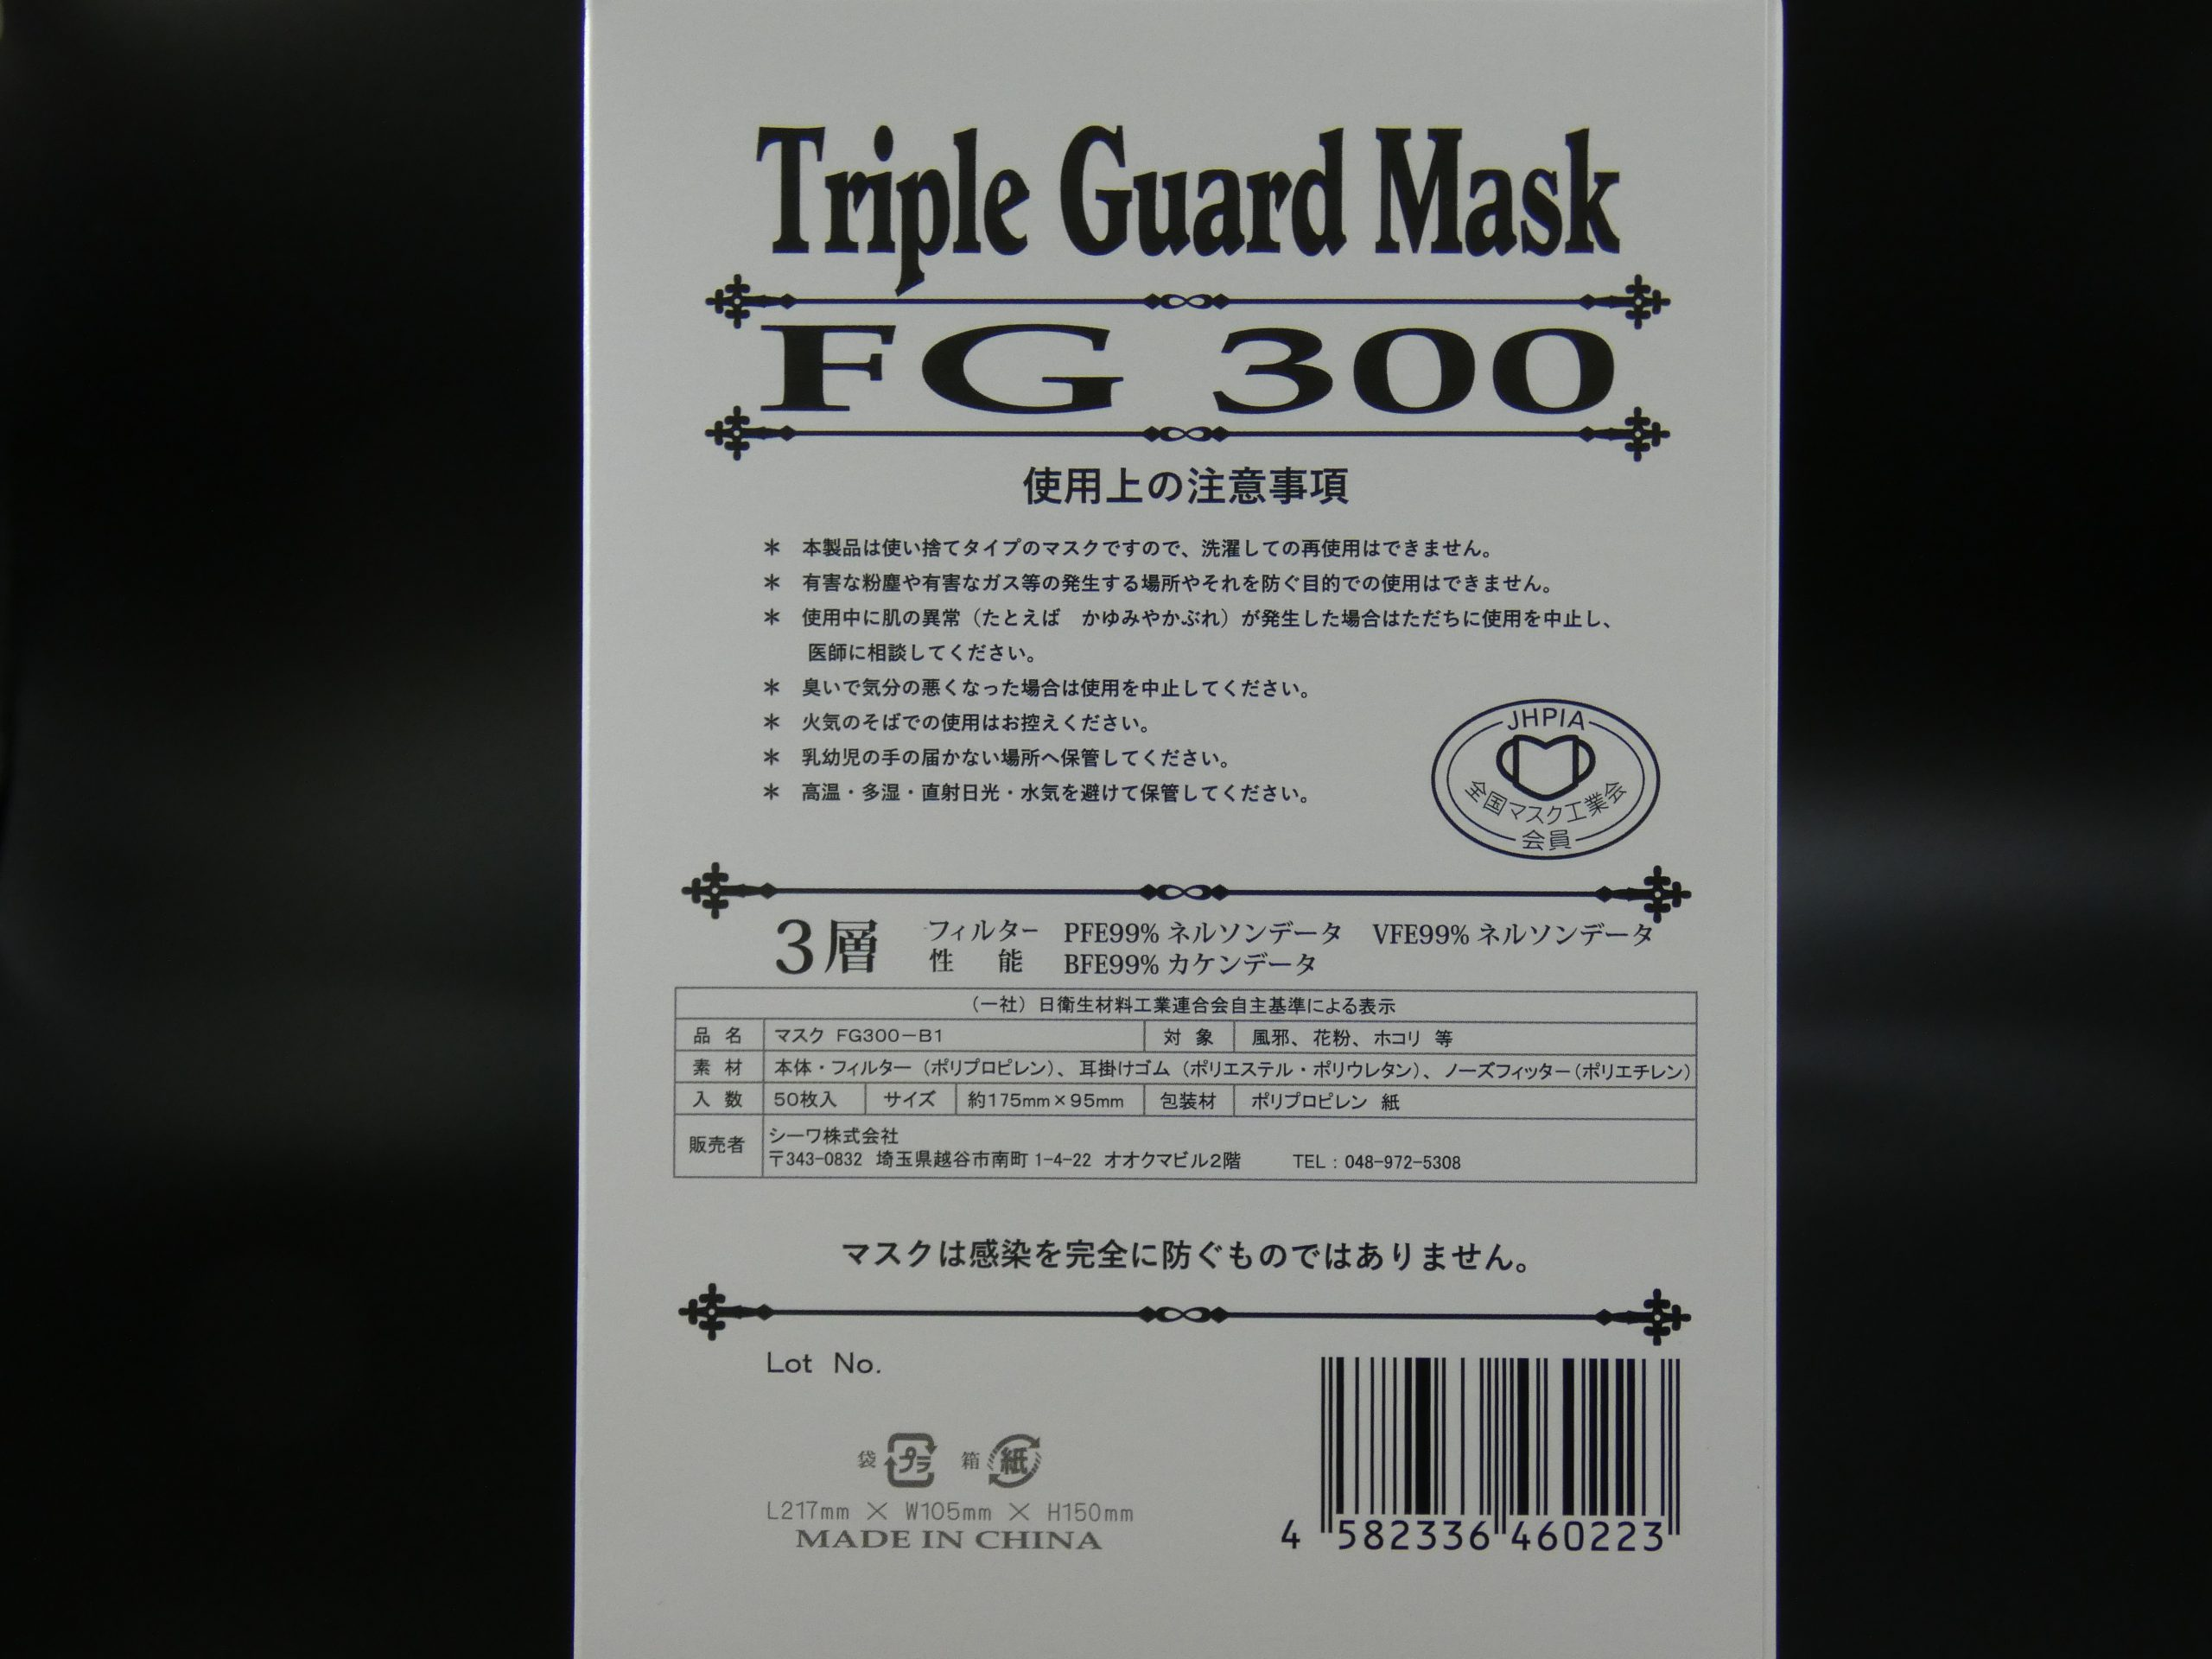 FG300-B1